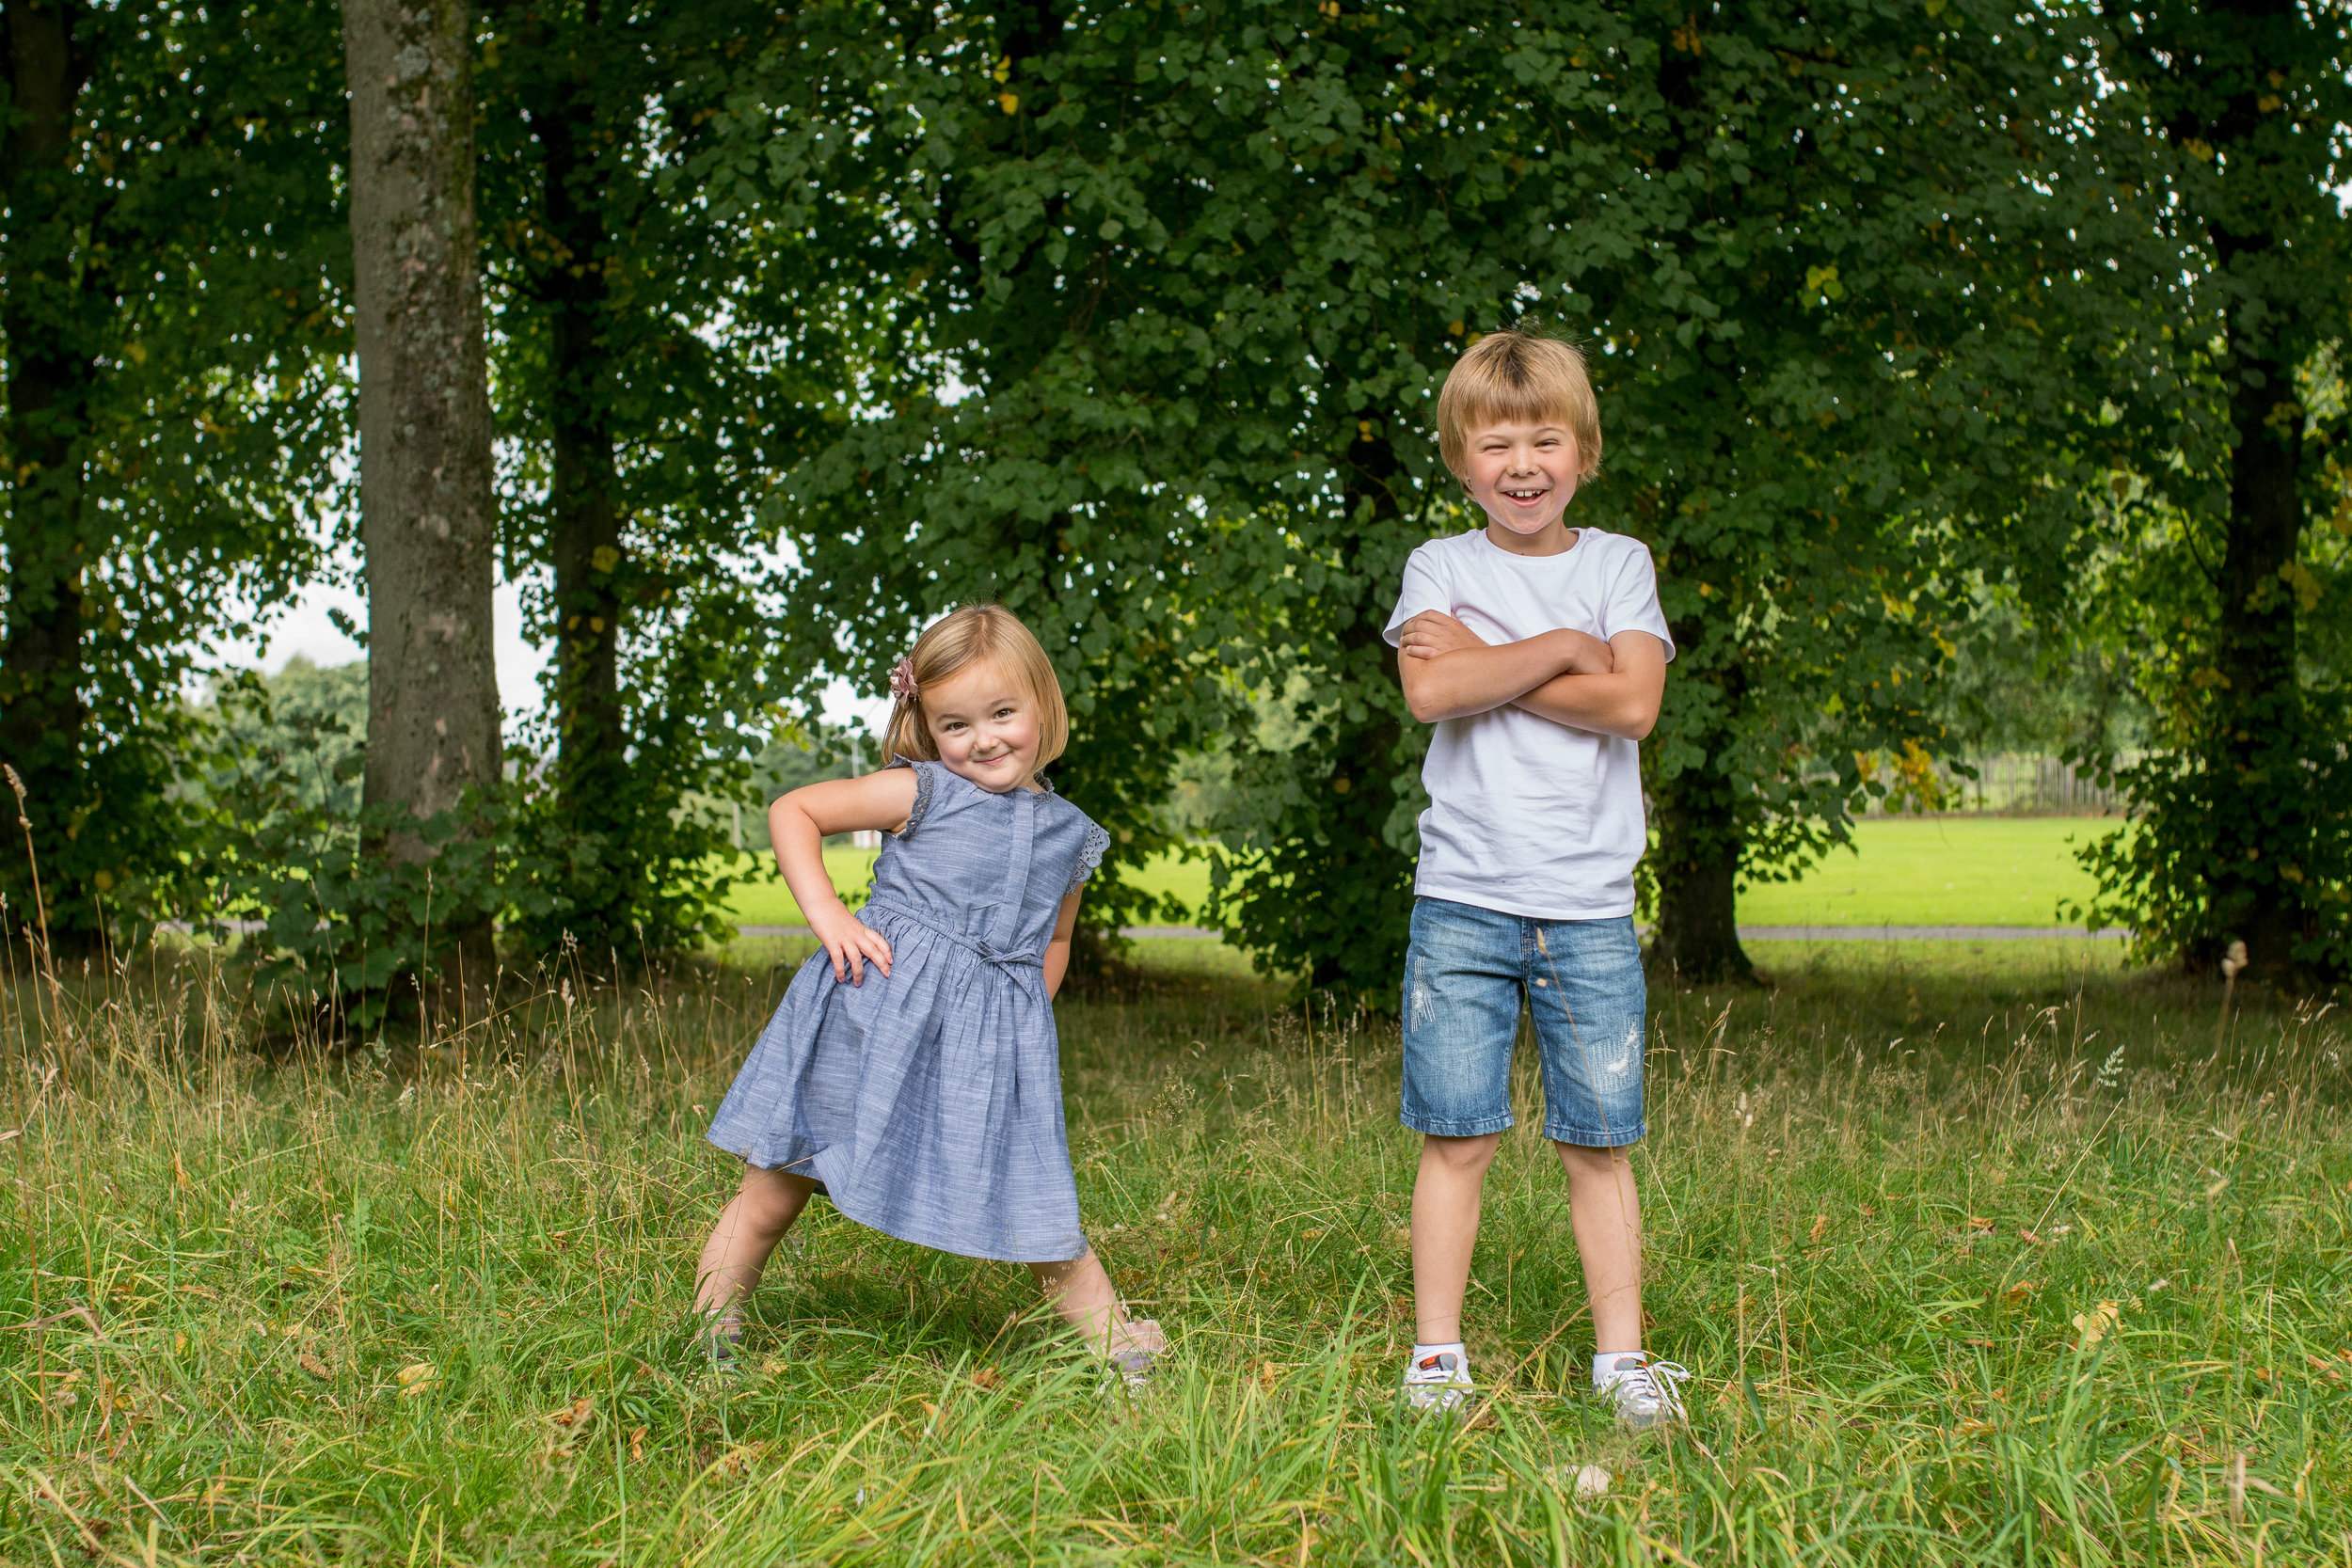 sibling portrait bars haw park in paisley renfrewshire